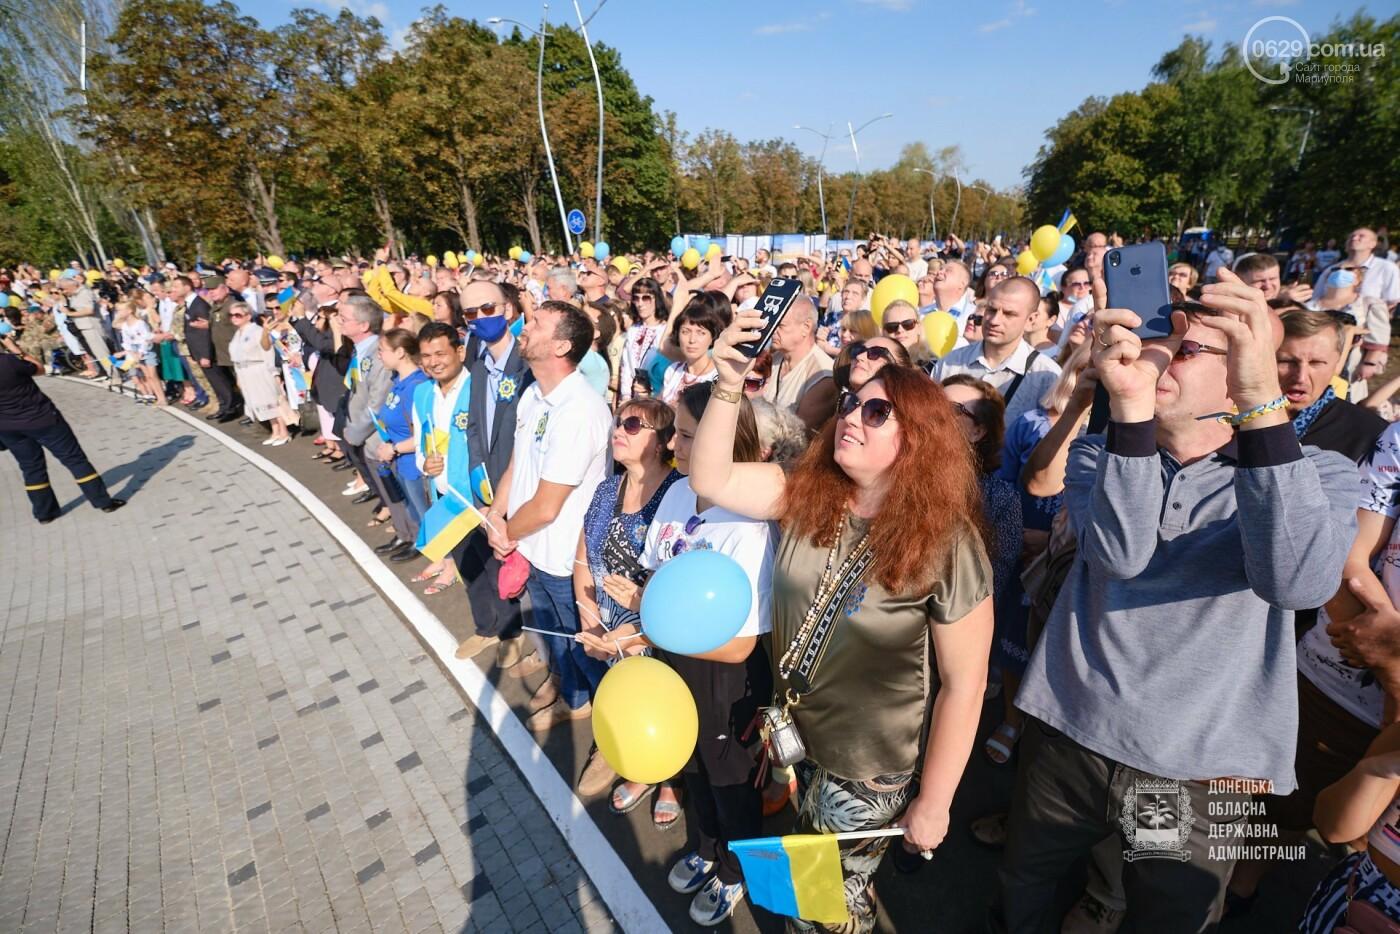 В Донецкой области подняли флаг Украины на 80 метров, - ФОТО, фото-7